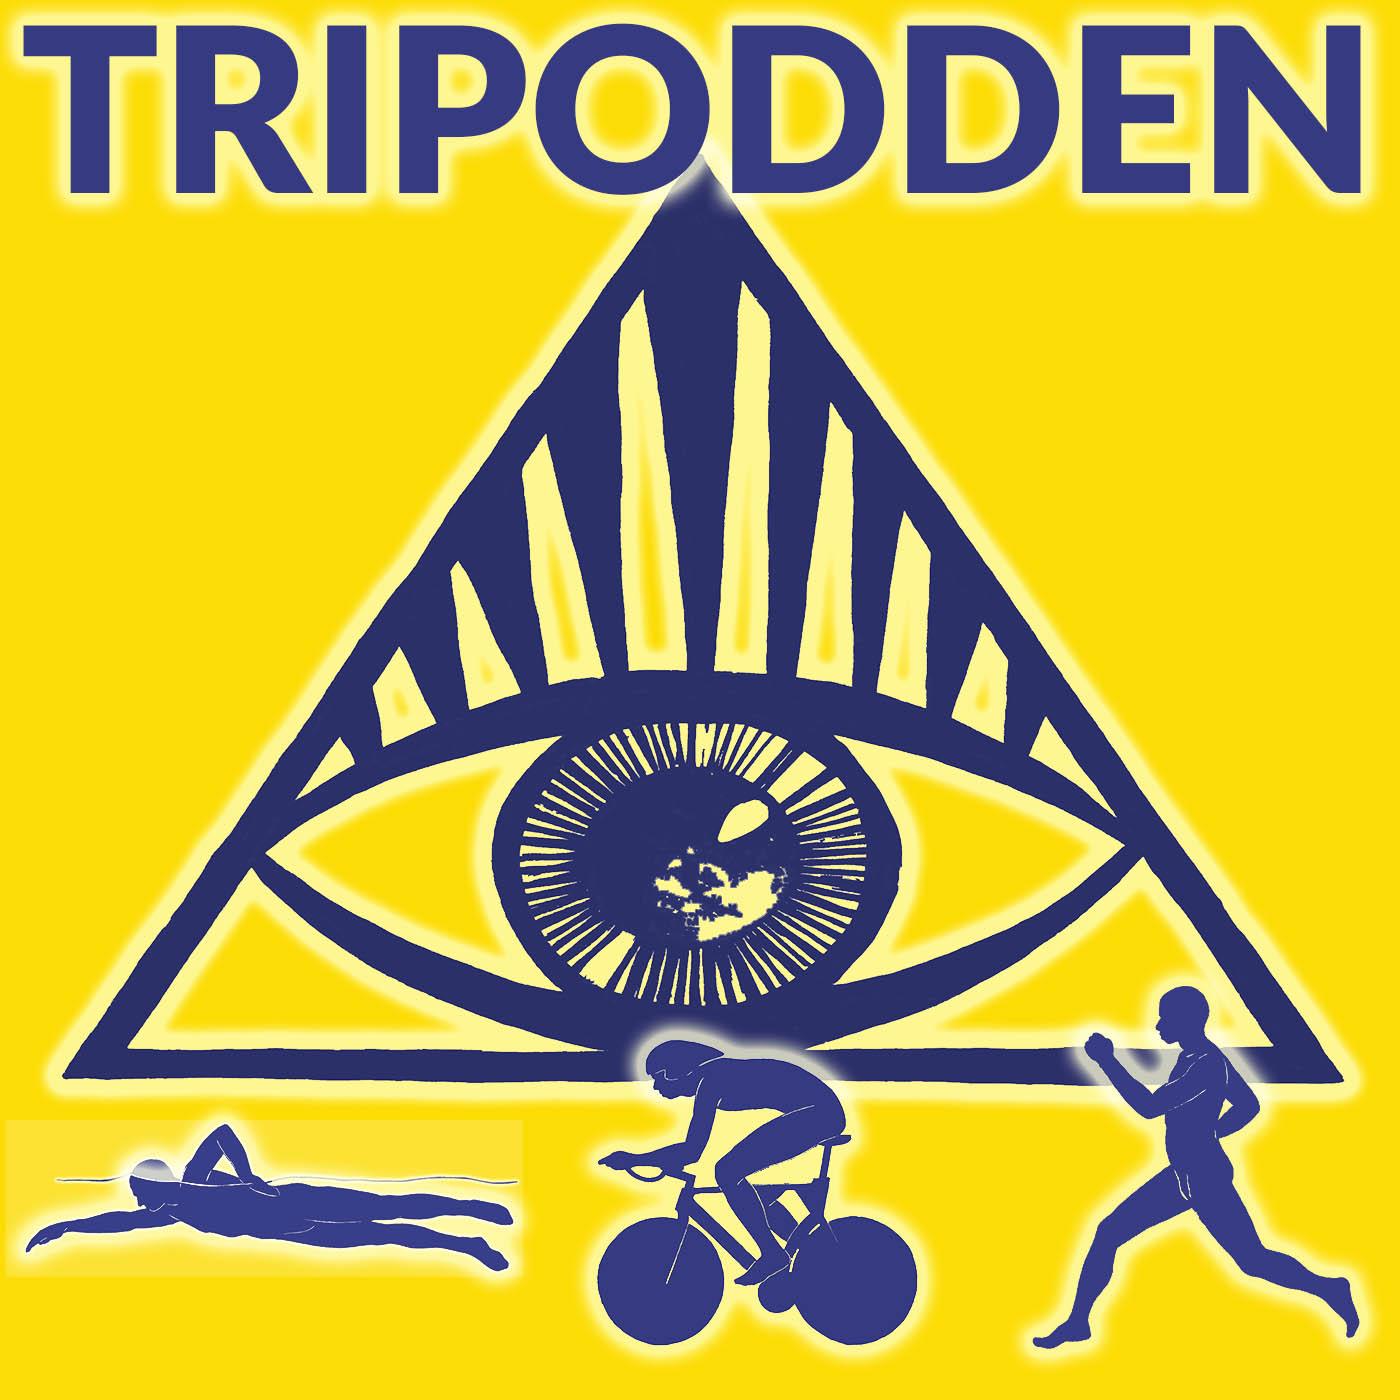 Tripodden